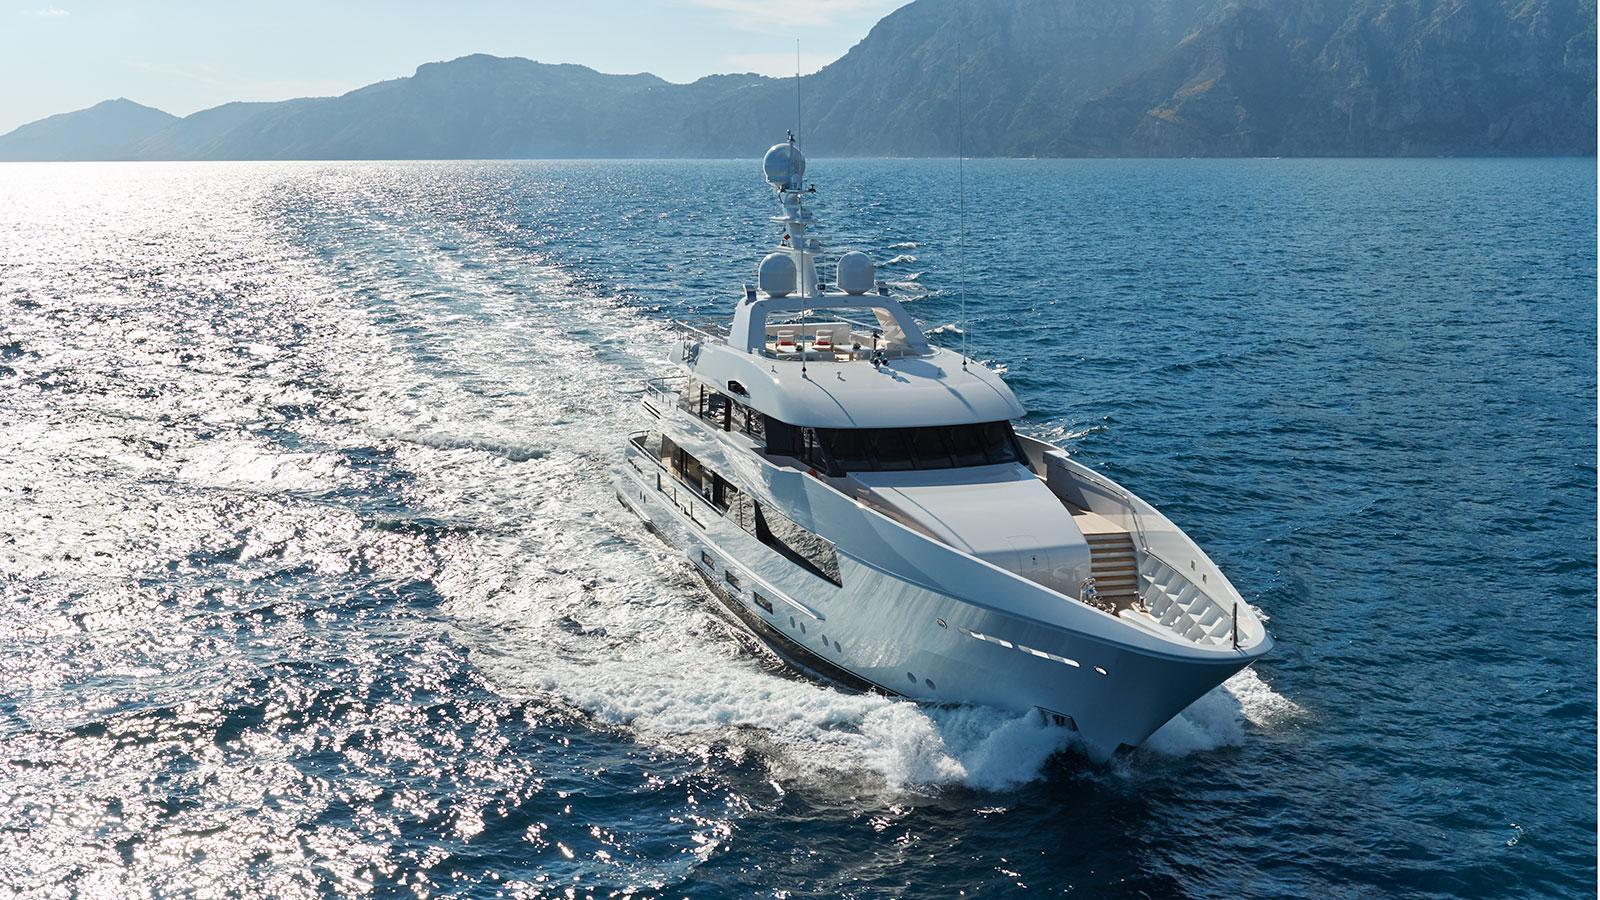 moon-sand-motor-yacht-feadship-2015-44m-cruising-bow